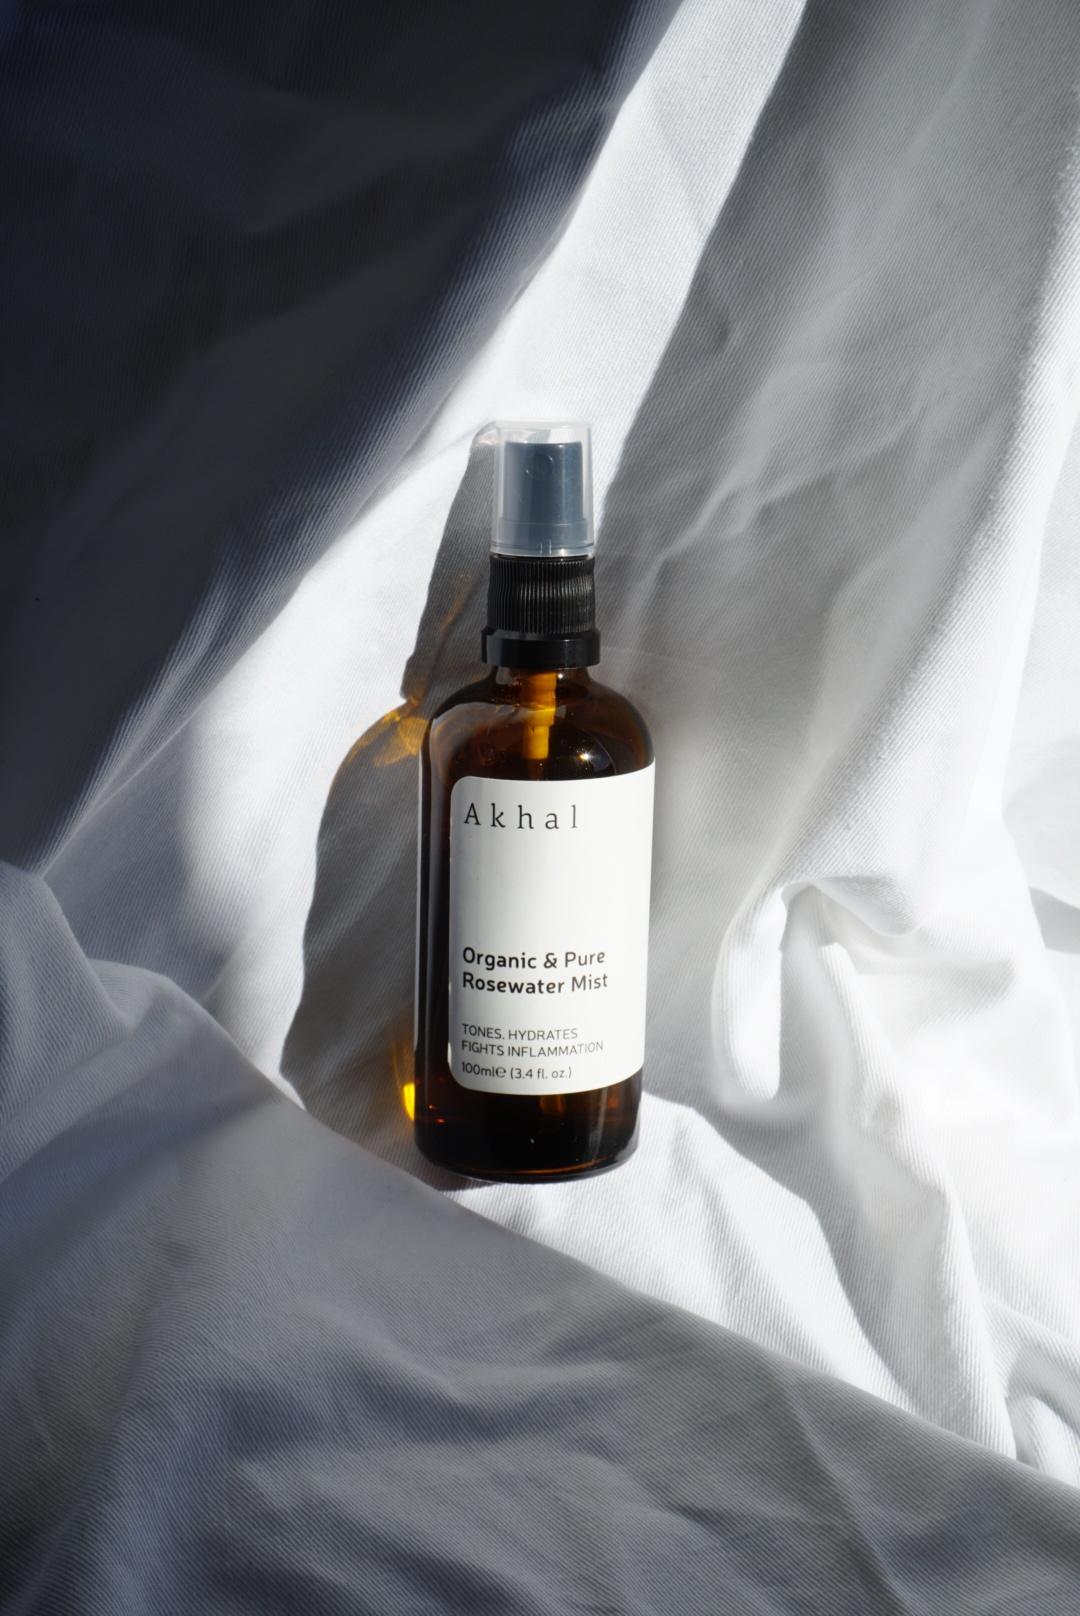 Akhal - Organic Rosewater Mist